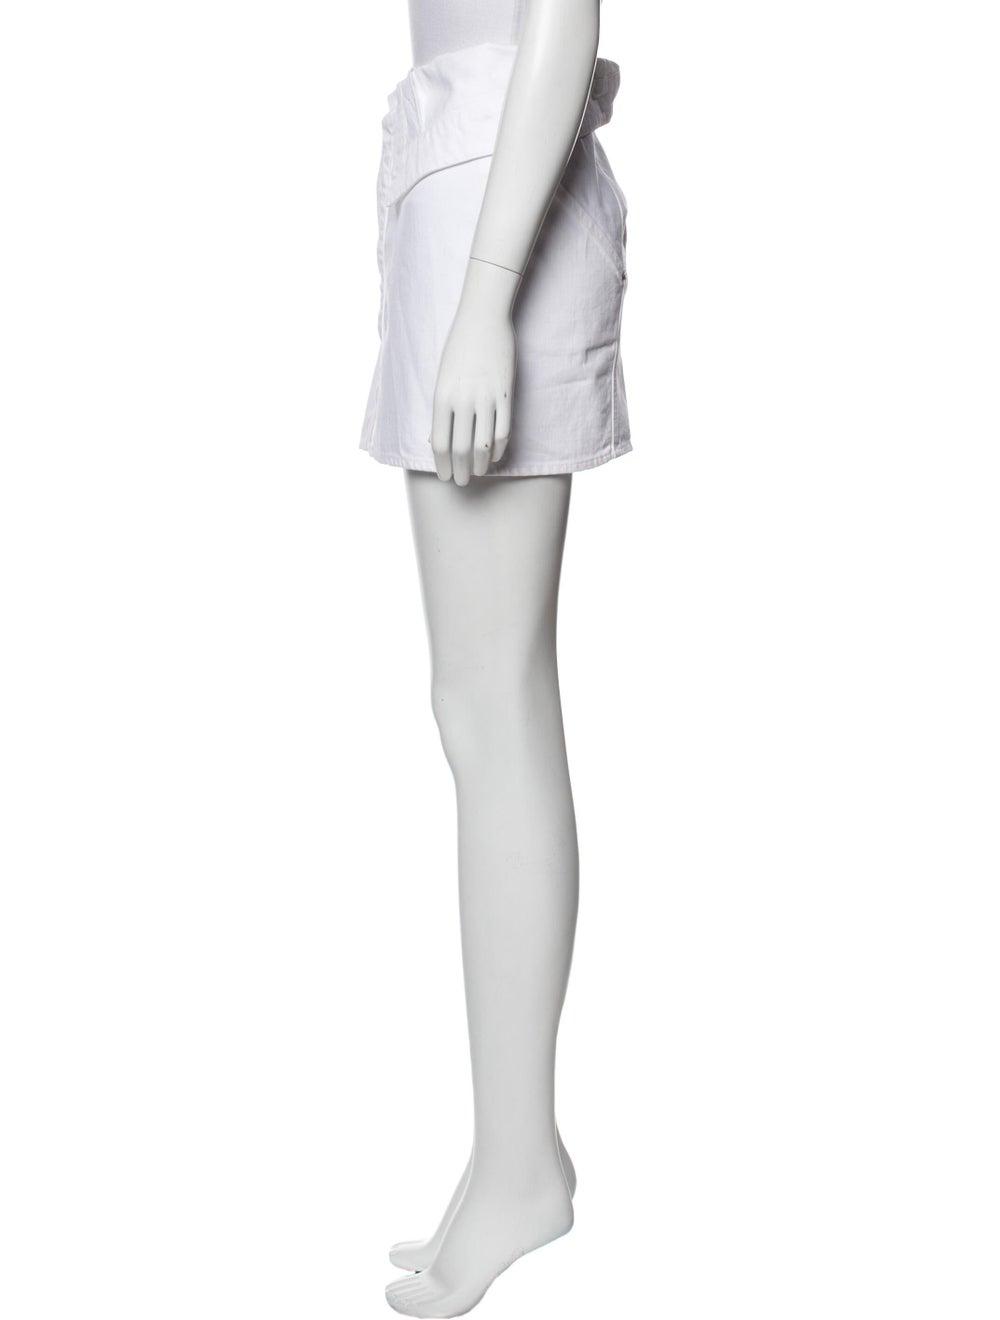 Jacquemus Mini Skirt - image 2